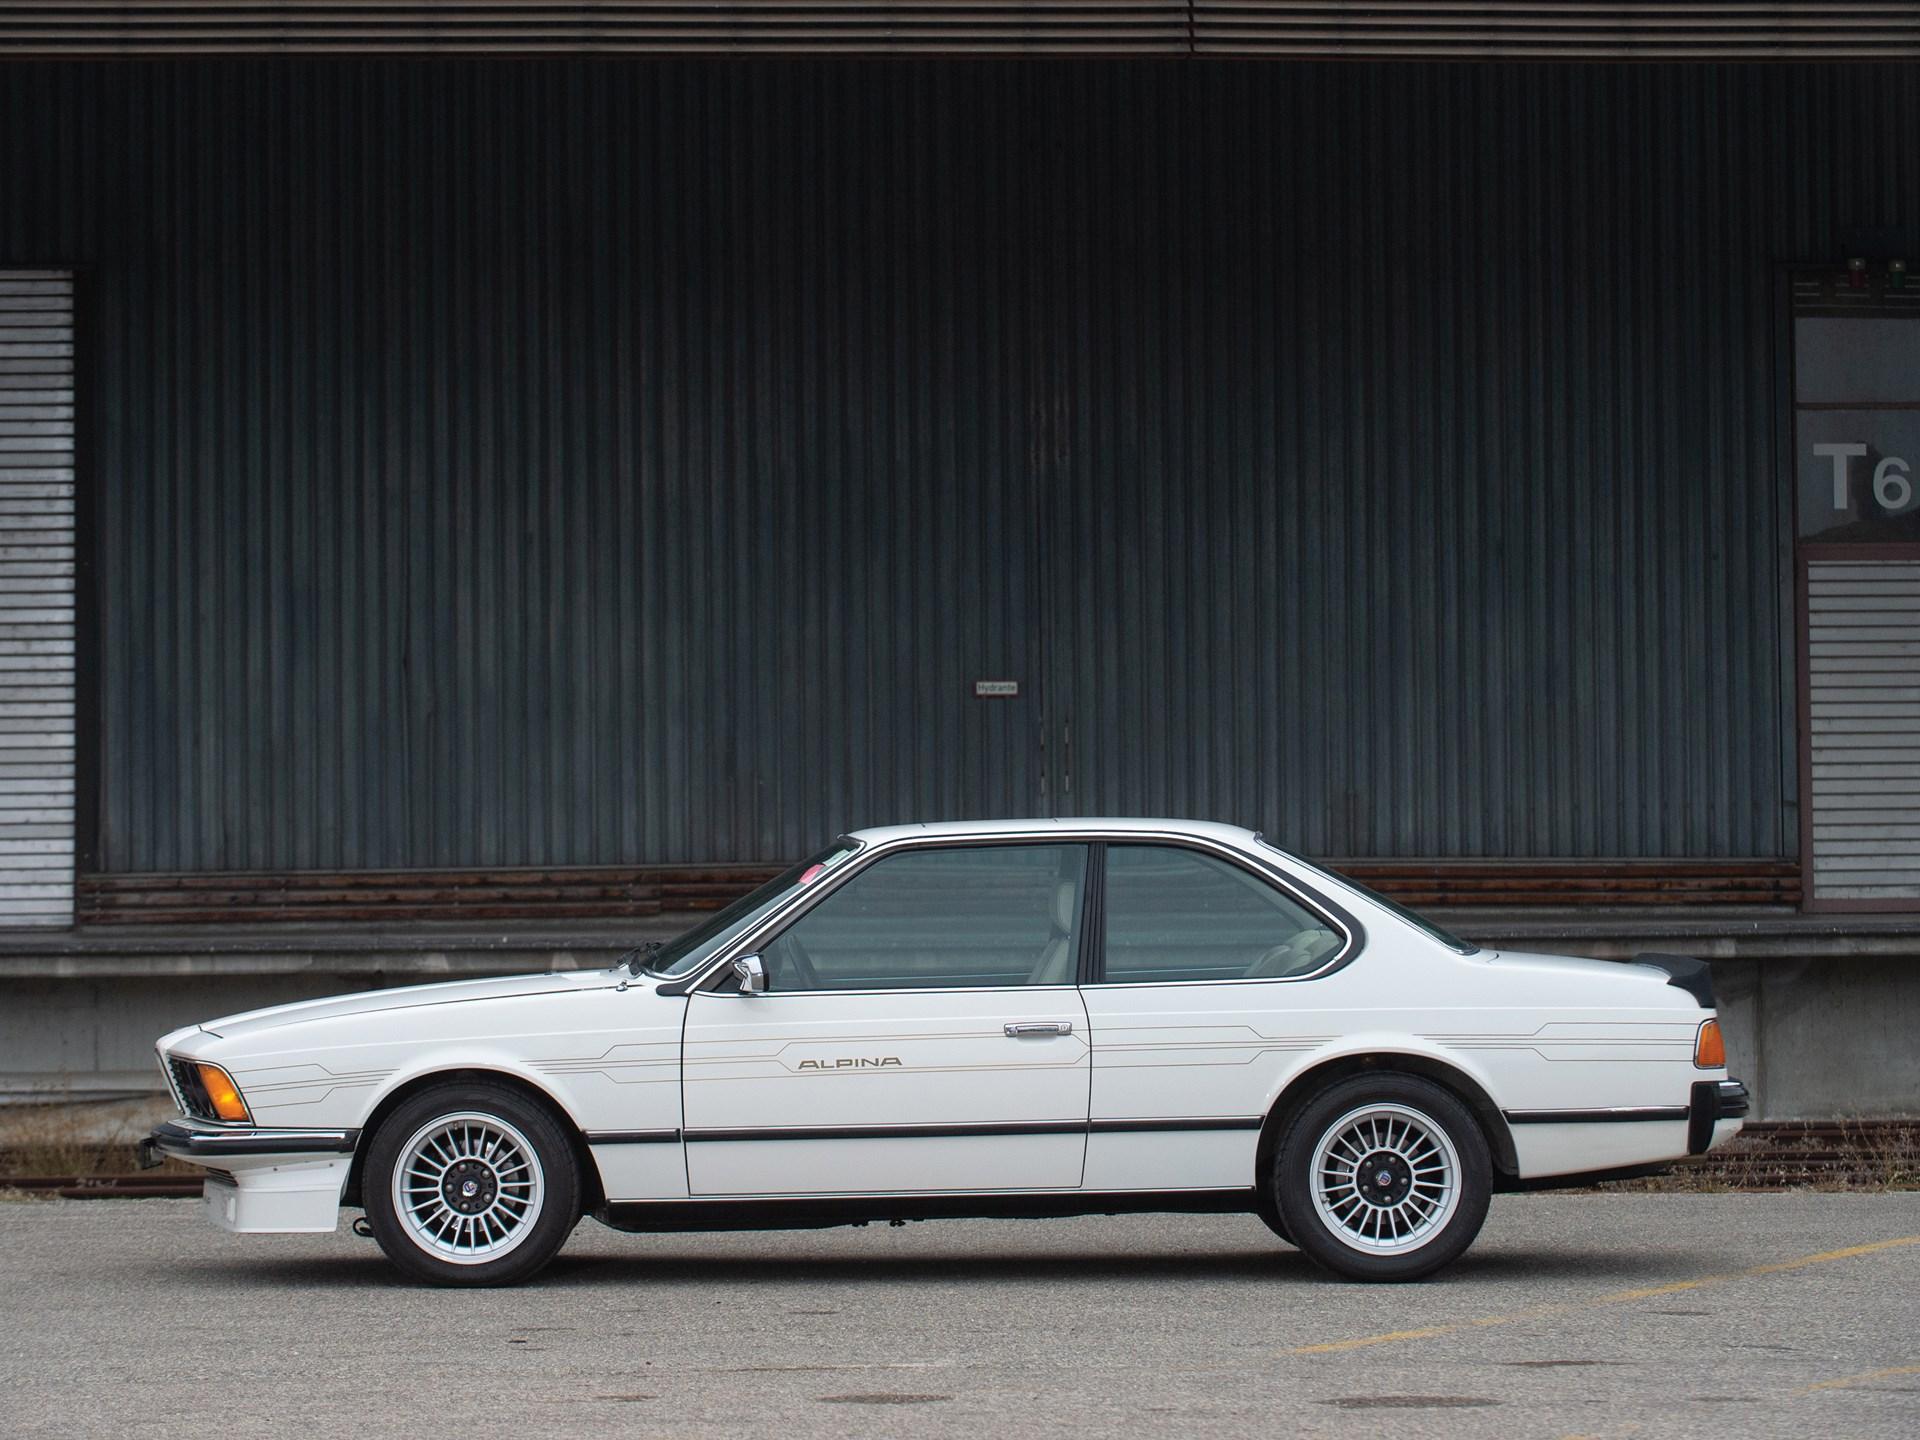 1982 BMW Alpina B7 Turbo Coupé